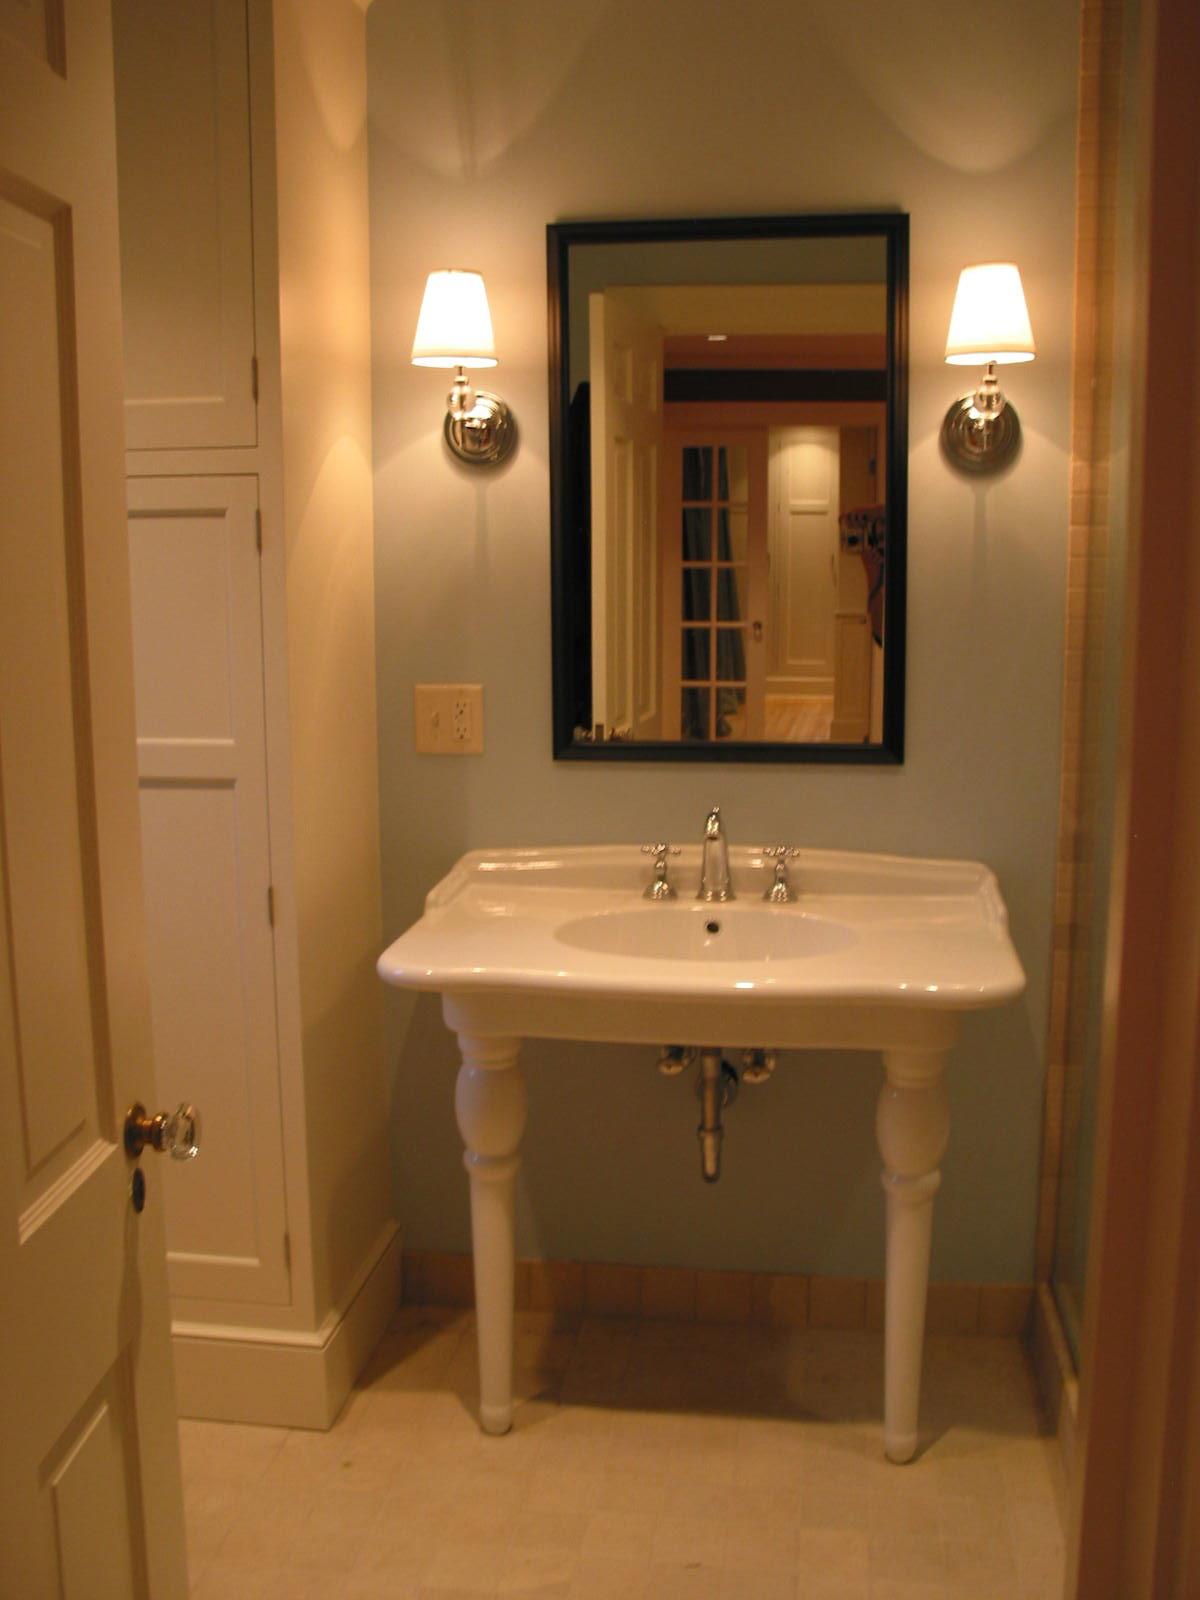 Whole-Builders-Bath-Remodel-2771